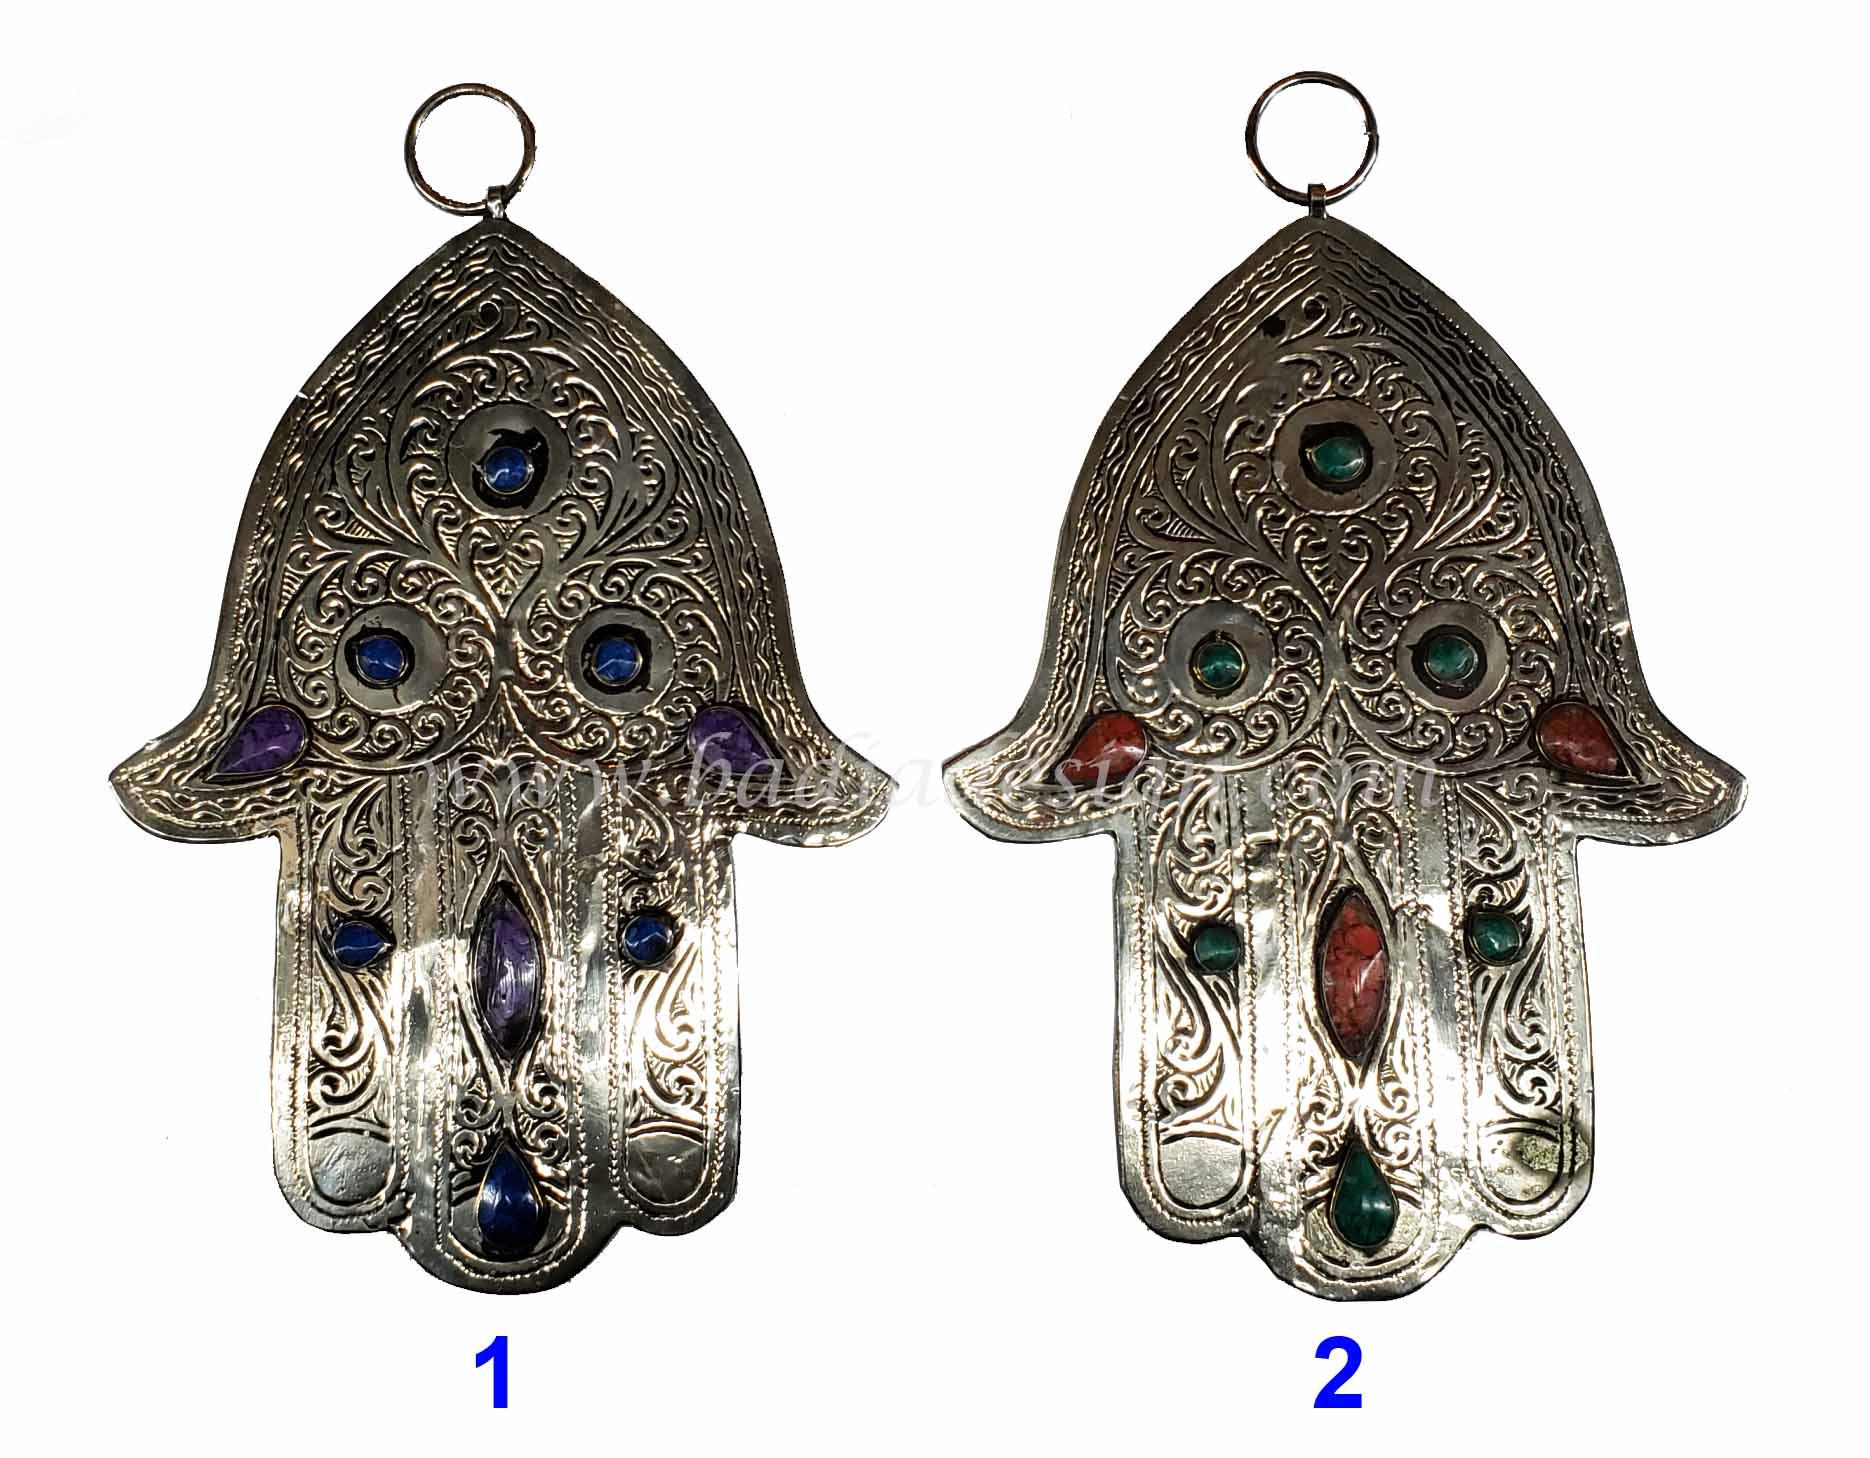 khamsa-hand-of-fatima-pendant-los-angeles-hf191.jpg